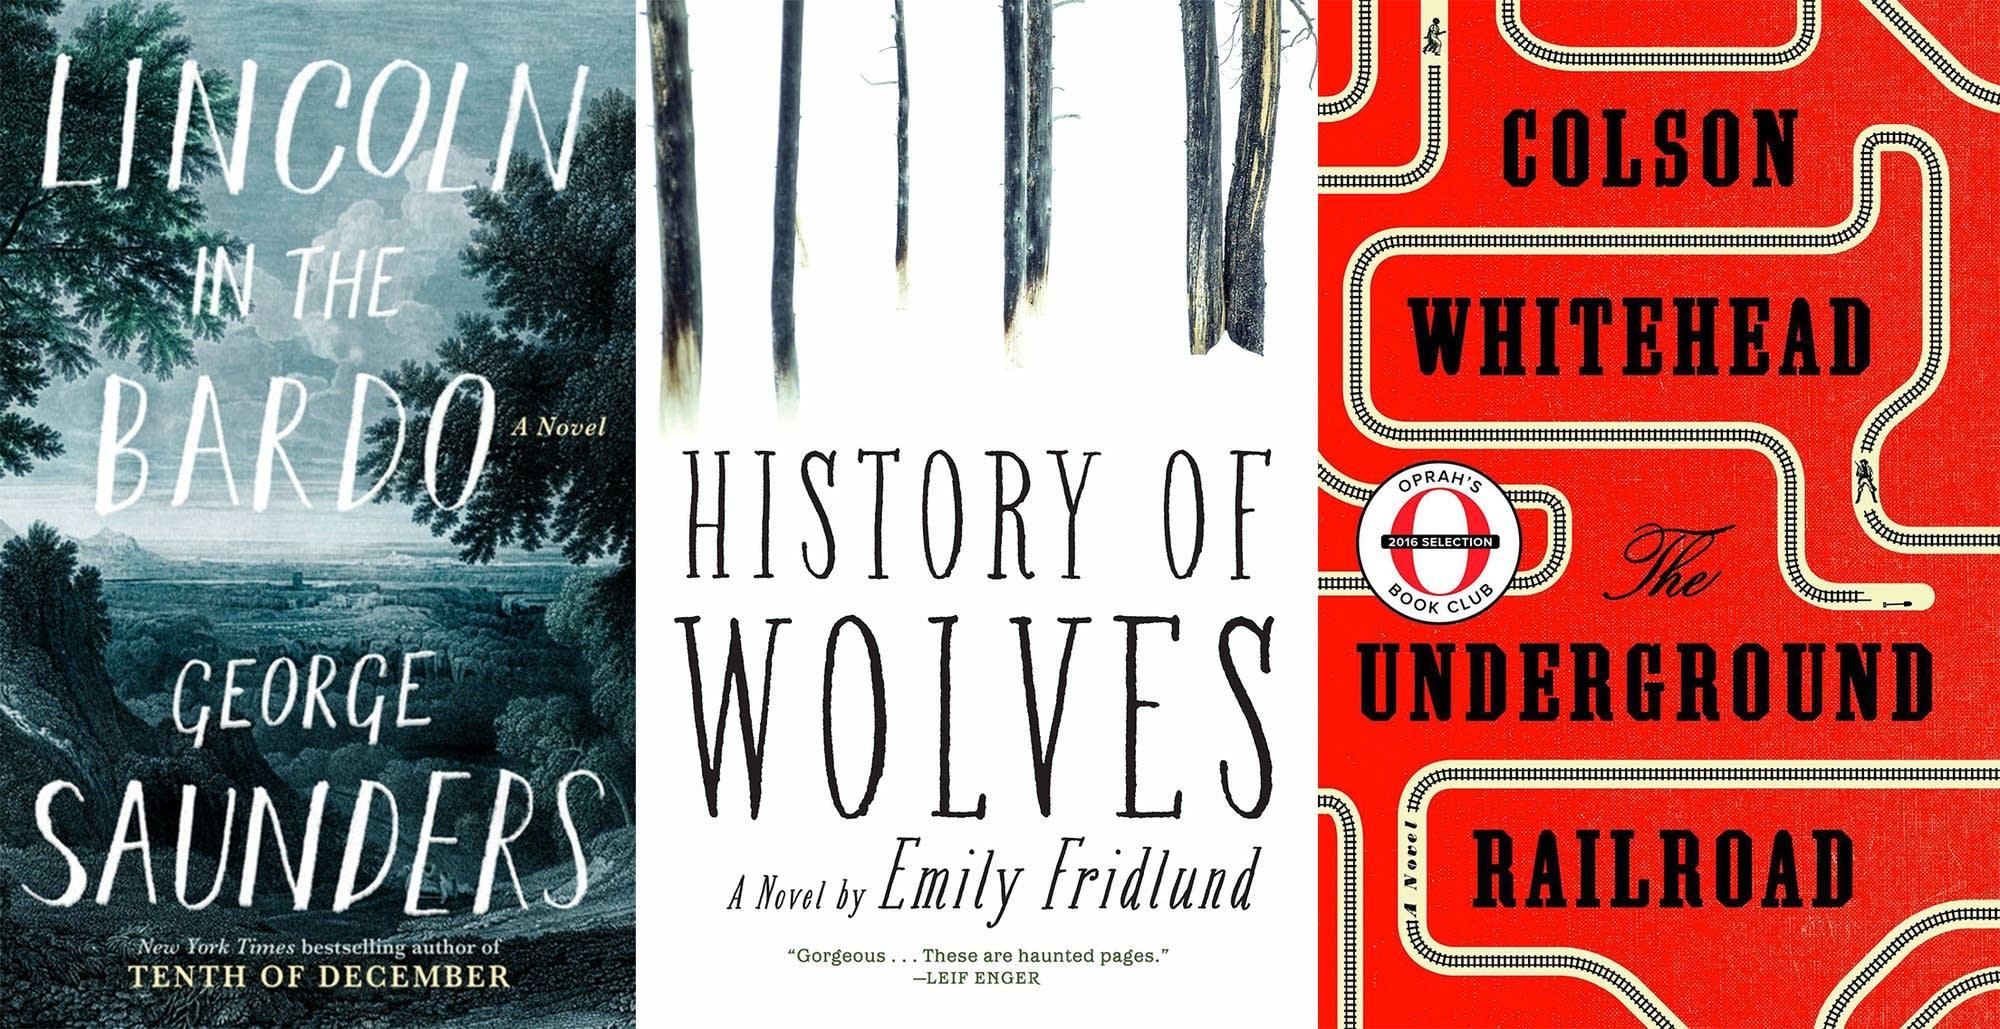 A few novels from the 2017 Man Booker longlist